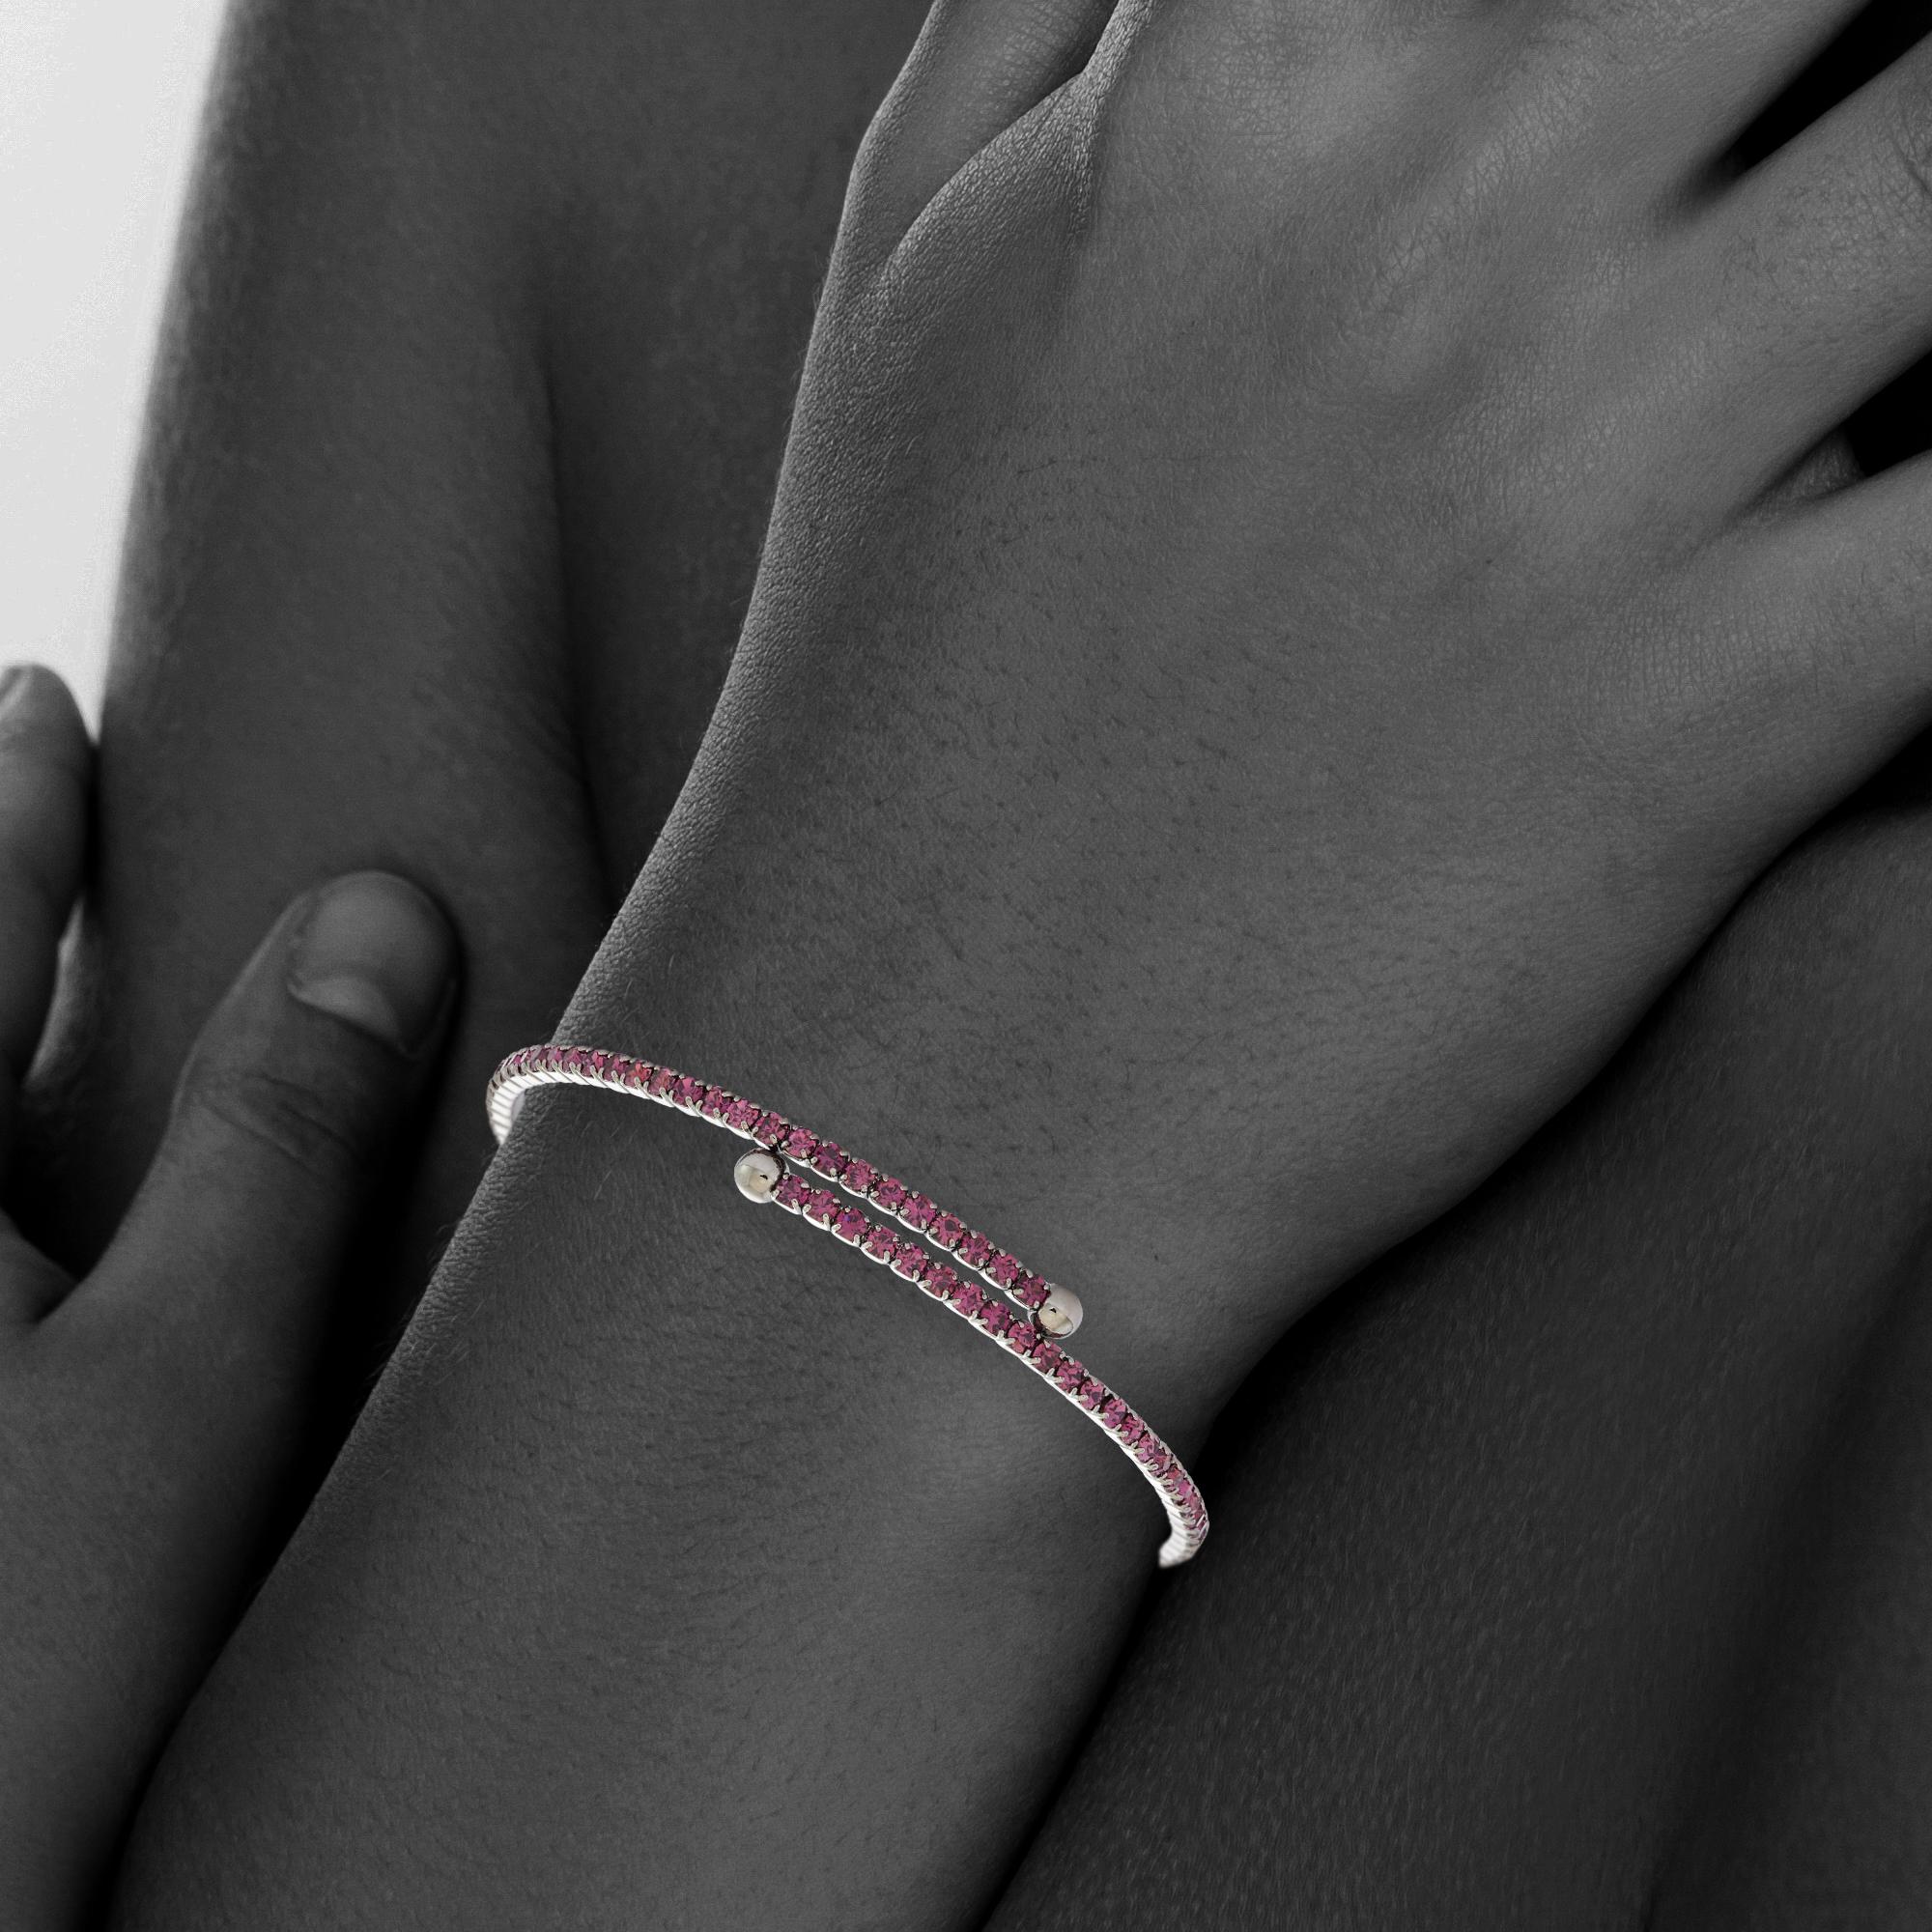 Womens-Ladies-Fashion-Accessories-Jewelry-Black-Rhodium-Plated-Bangle-Bracelet thumbnail 10